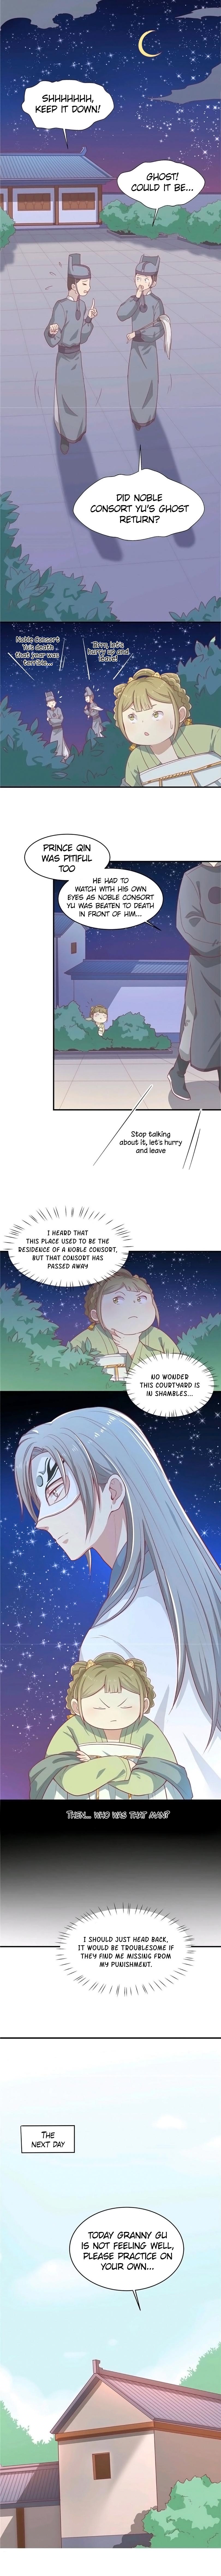 https://img2.nineanime.com/comics/pic4/11/26891/1656506/862690c612c4c41a2ddceb9bf7a5c848.jpg Page 1